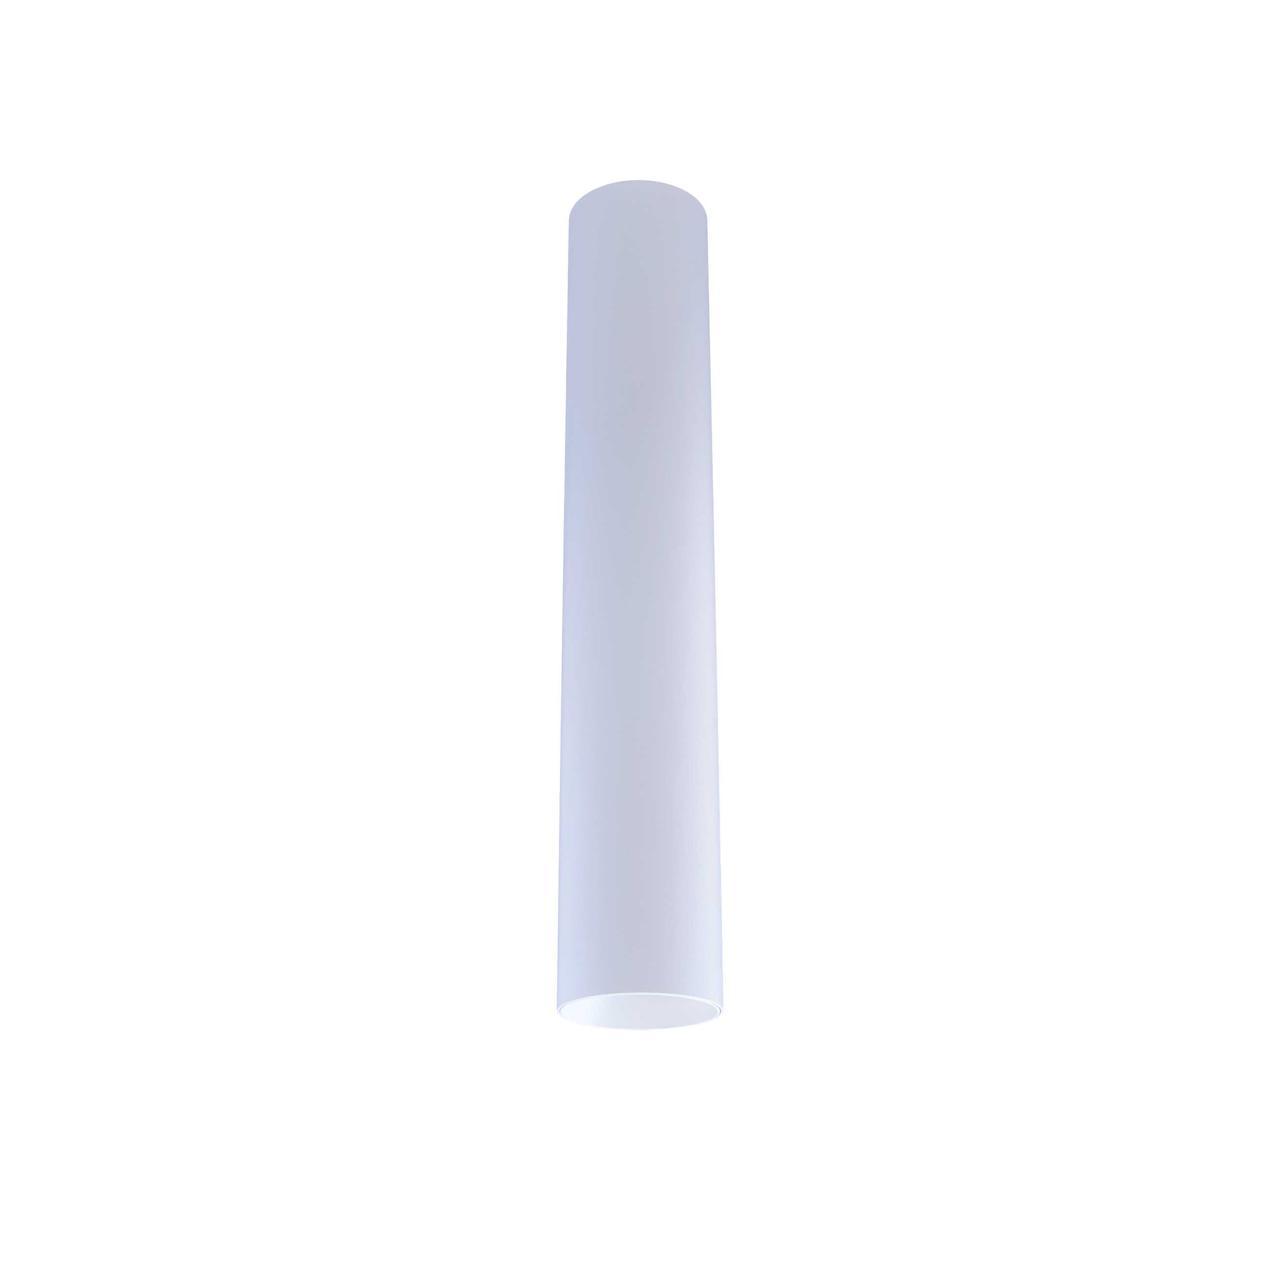 Led спот белый тубус TH6802-400 WH